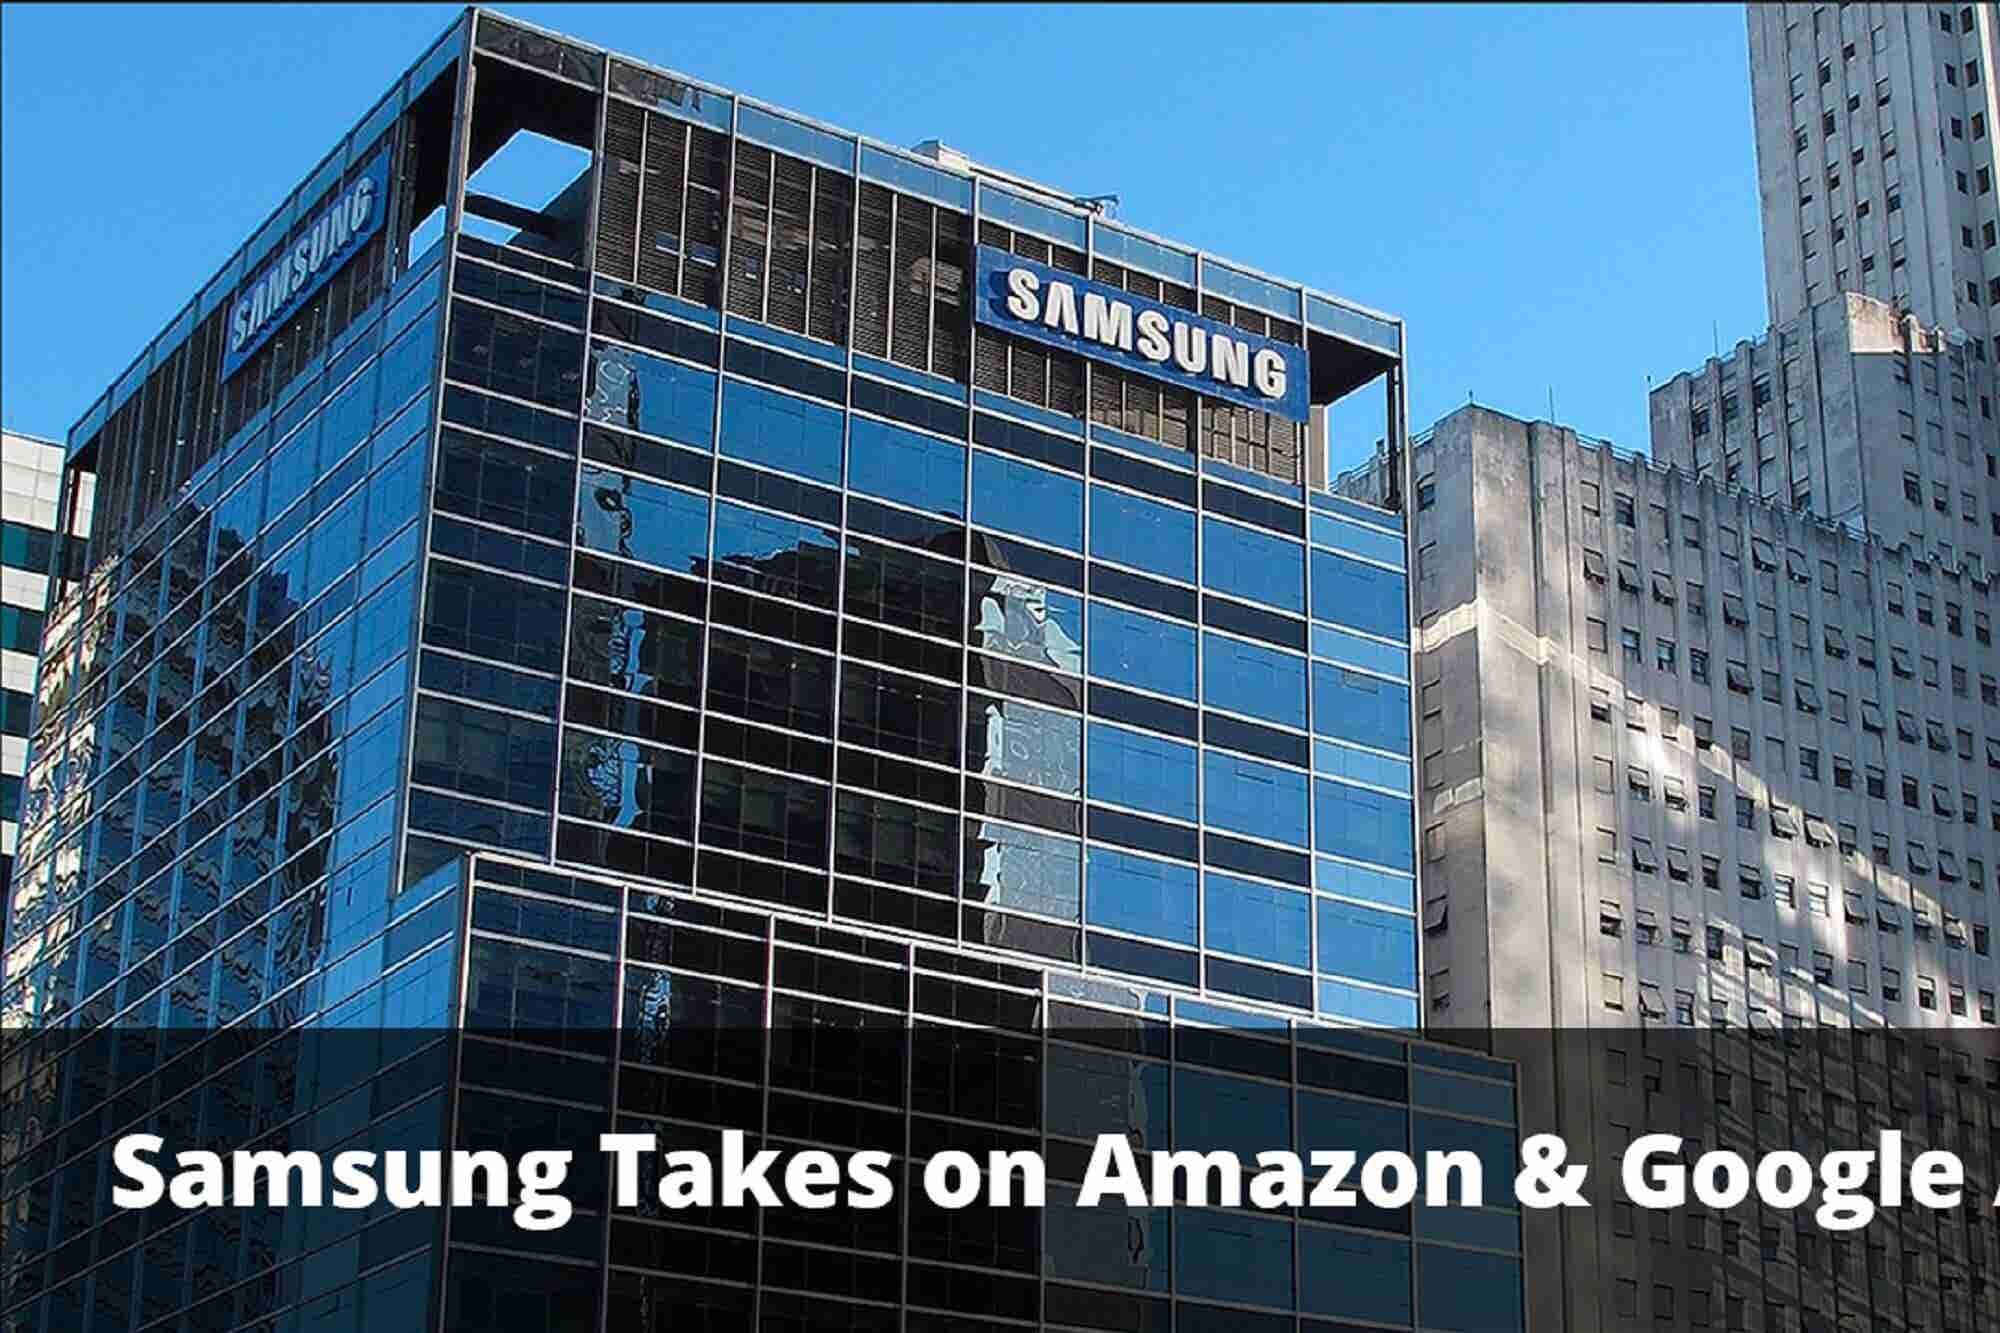 Samsung Echoes Into The Smart Speaker Market & Govt to Make $2 Billion...